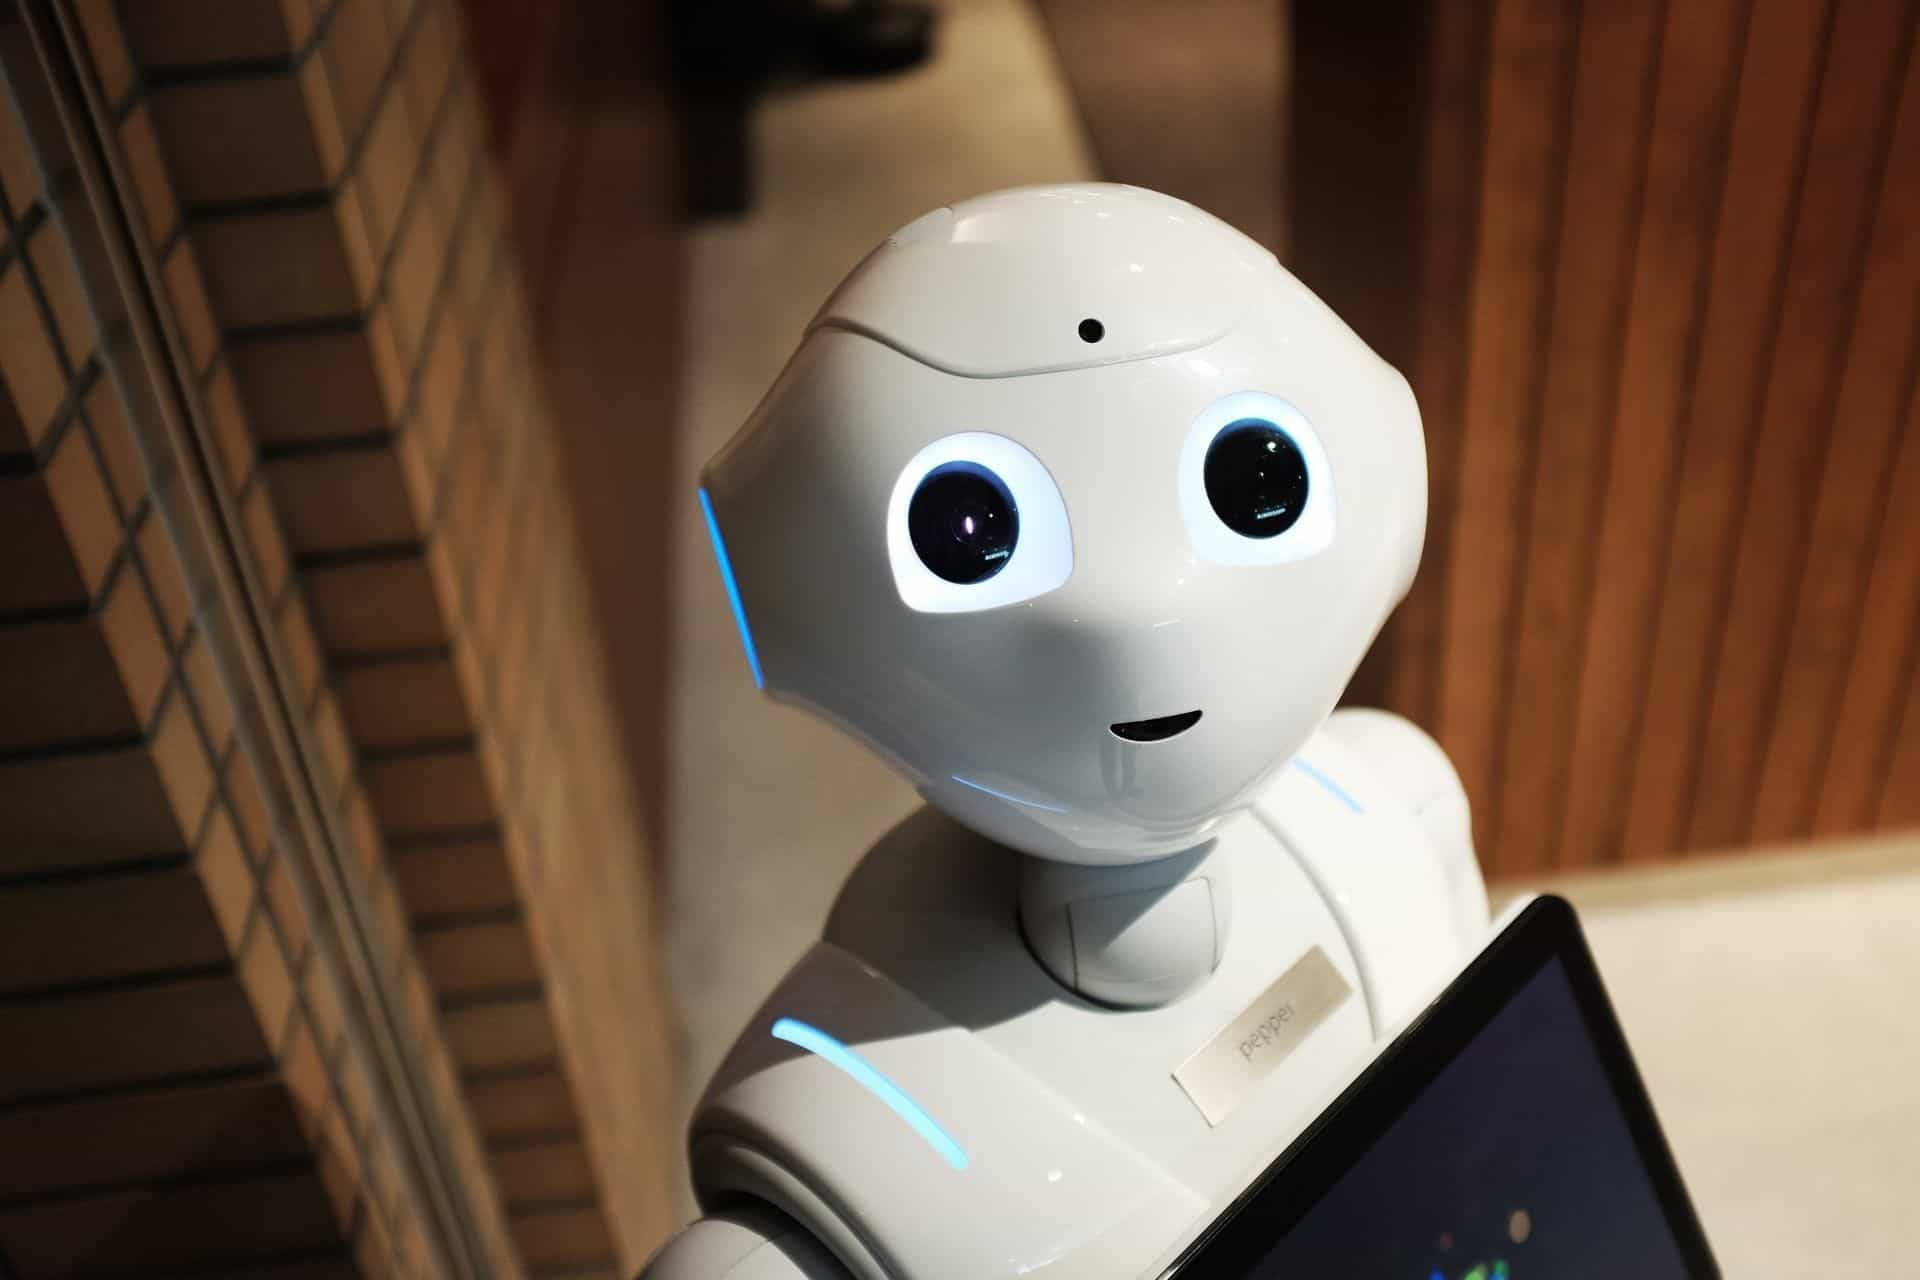 Why-Robot-Chefs-Make-Sense-for-Todays-Society